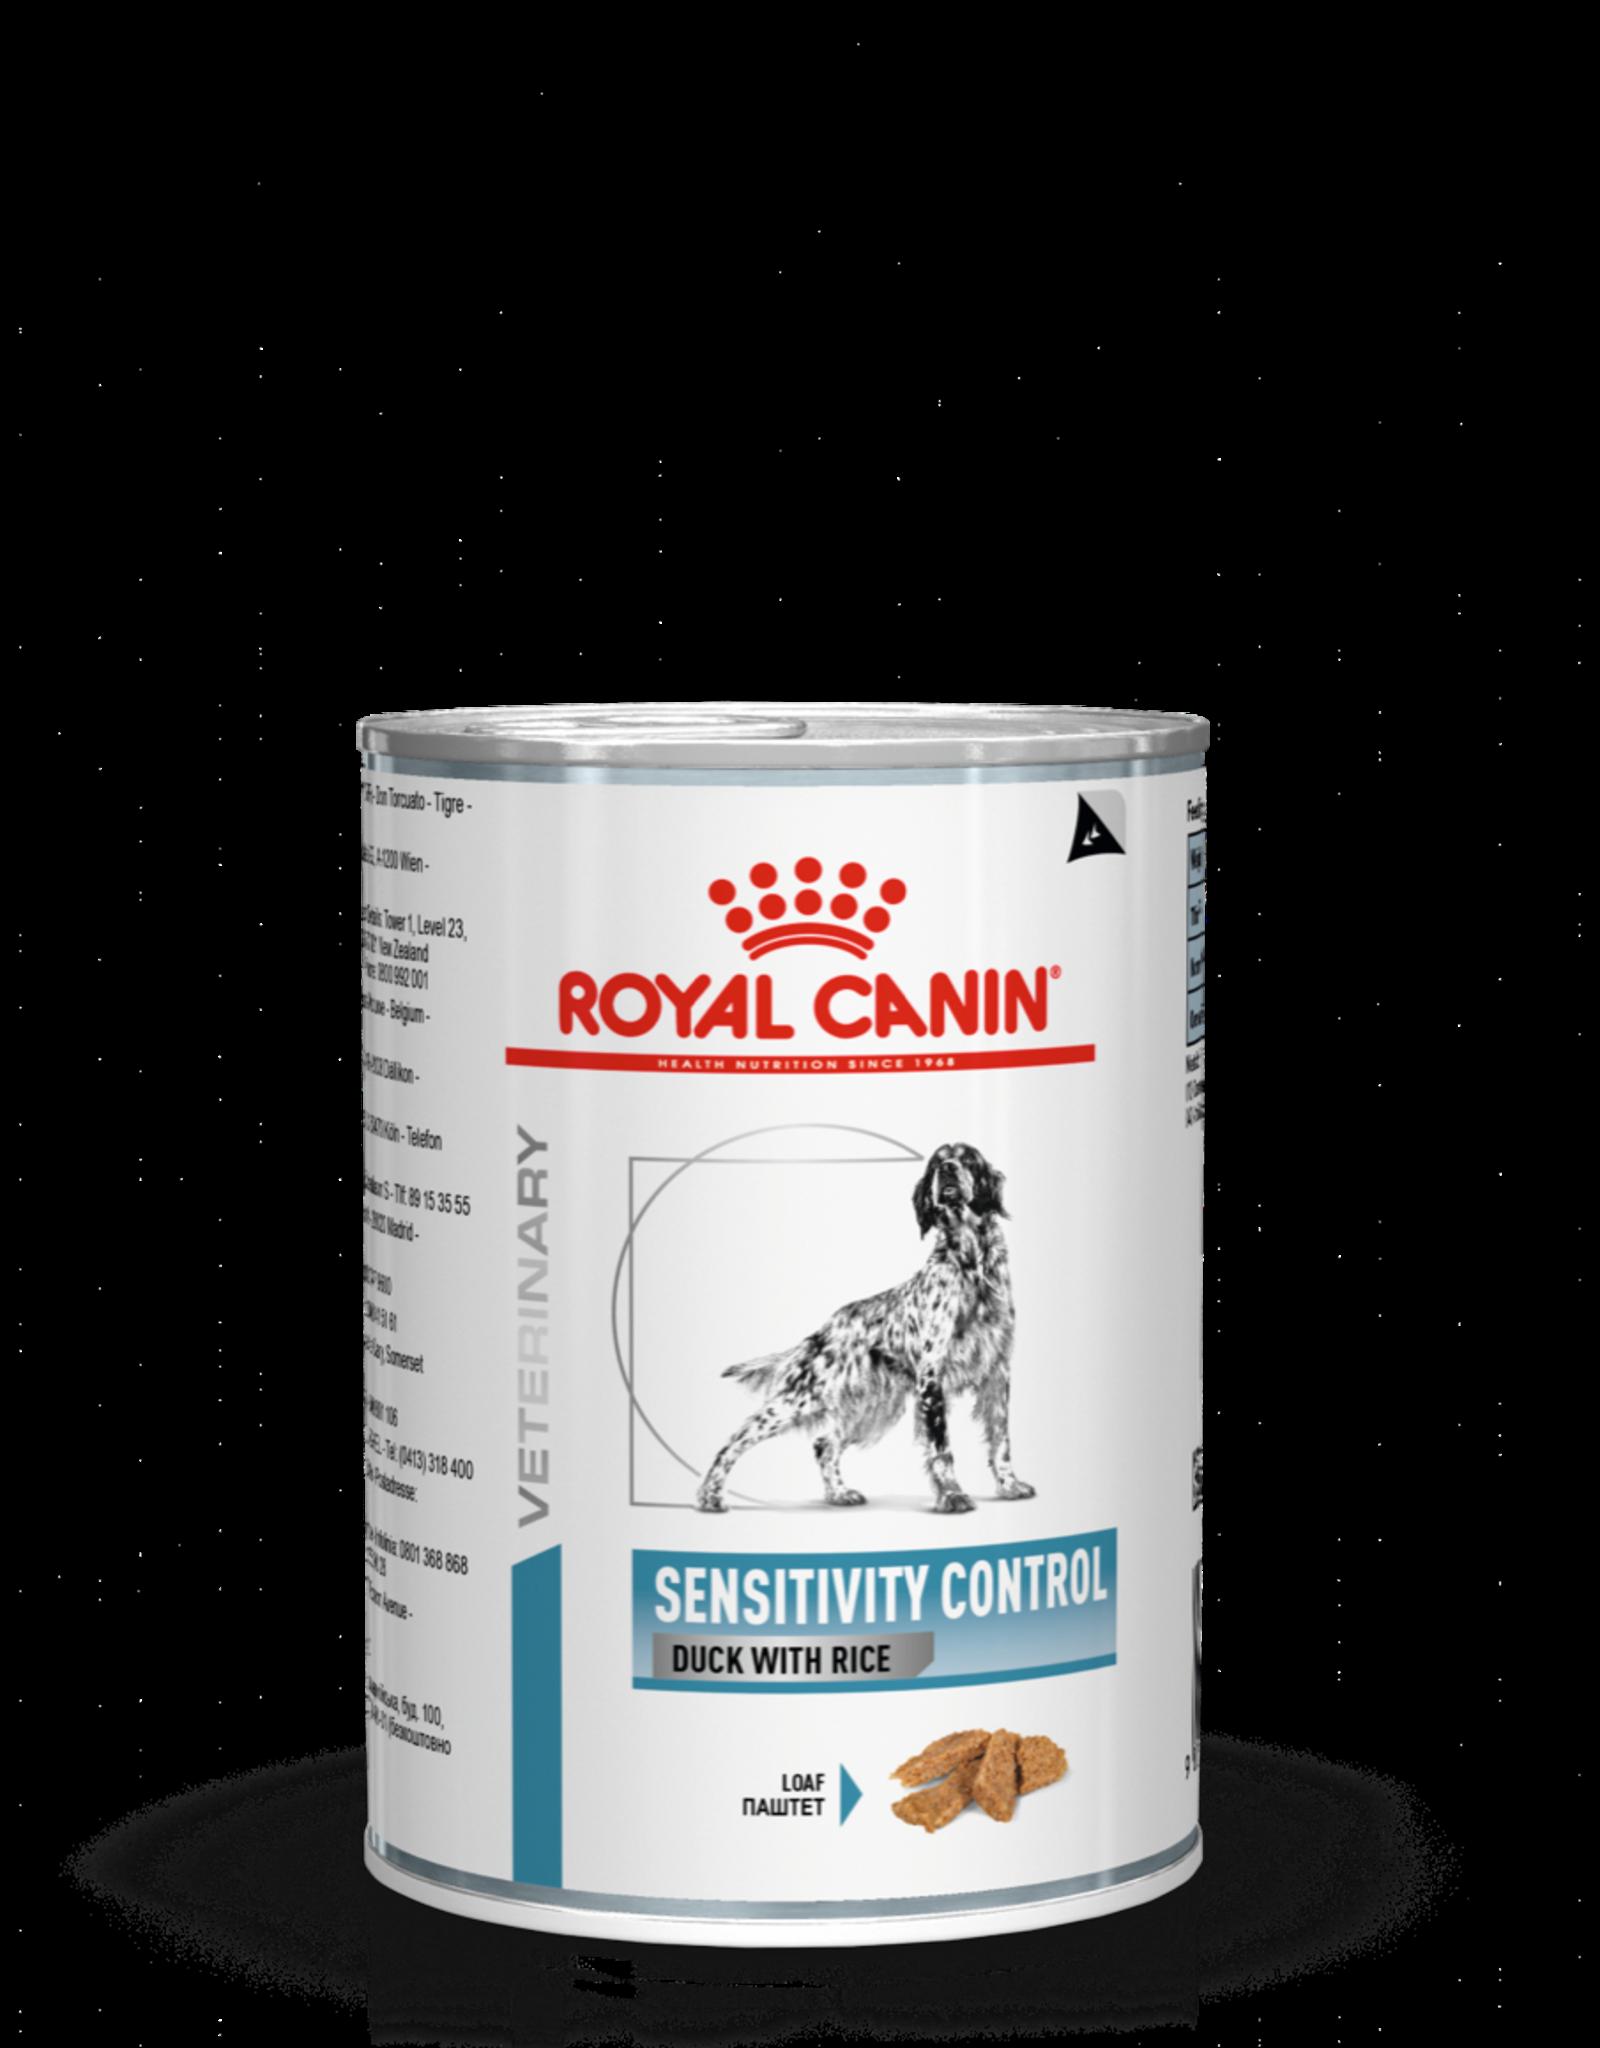 Royal Canin Royal Canin Sensitivity Control Chien Canard 12x420gr